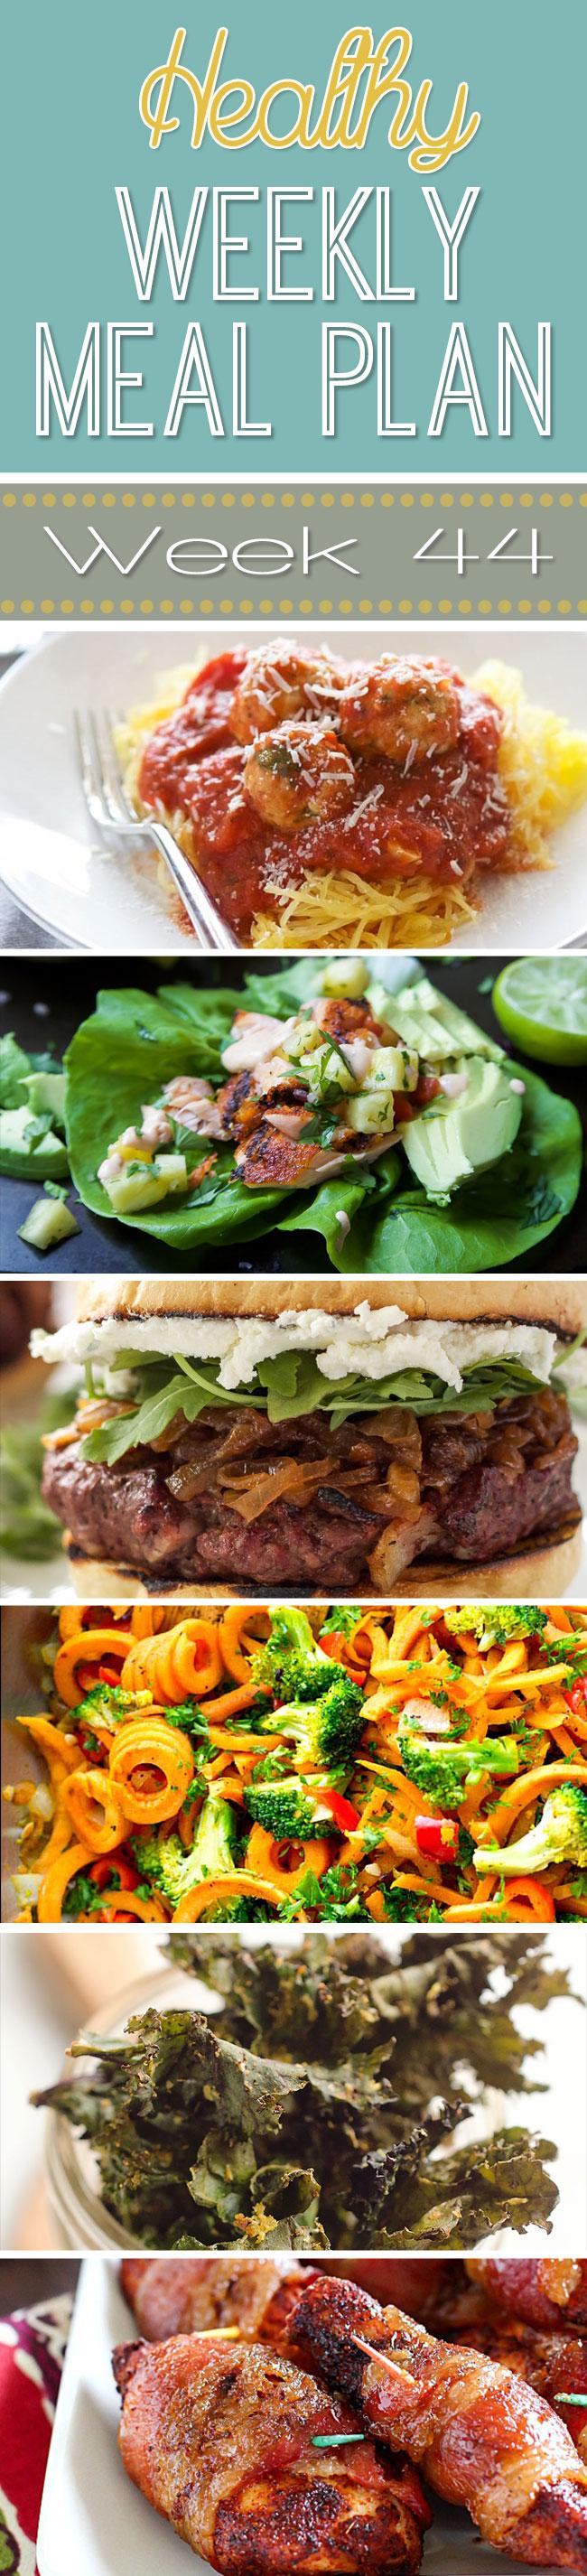 Healthy Weekly Meal Plan #44